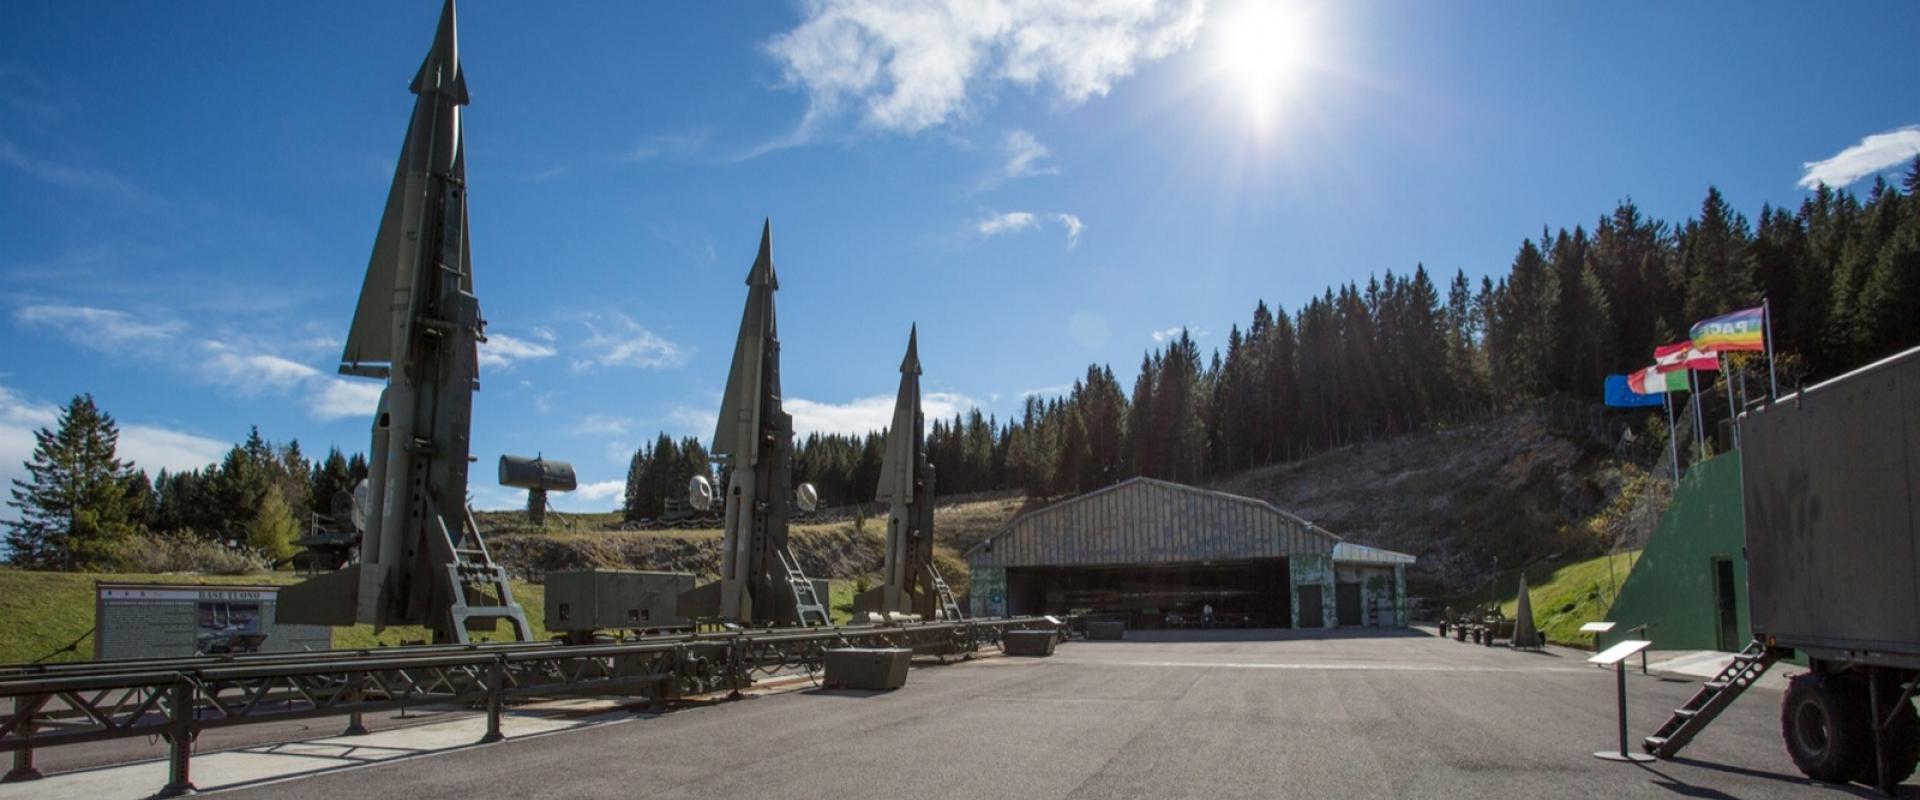 Visit of Base Tuono